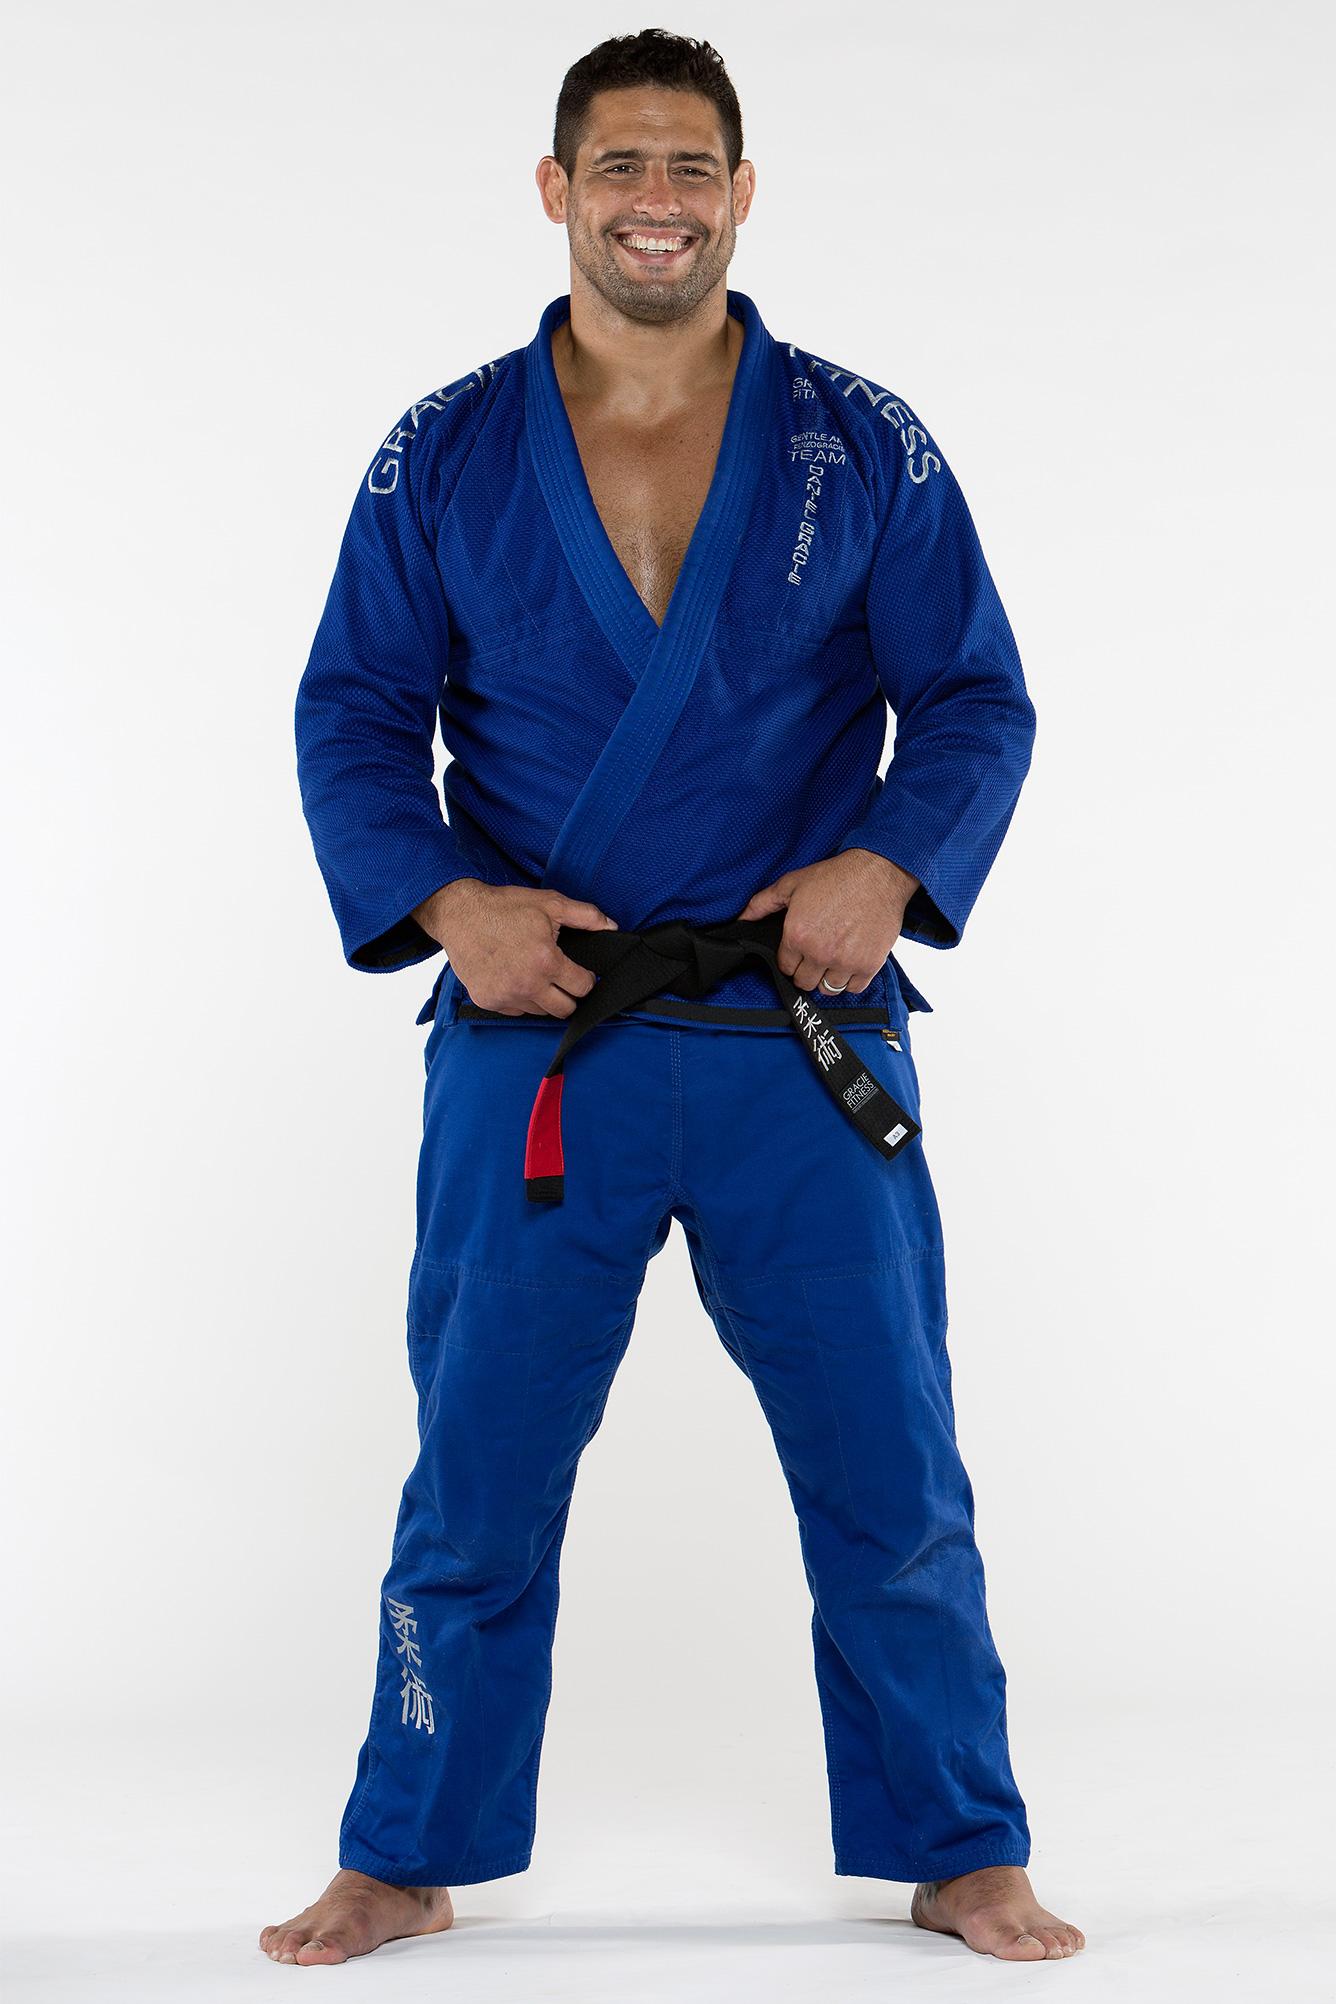 DANIEL GRACIE   Brazilian Jiu-Jitsu Black Belt and MMA athlete